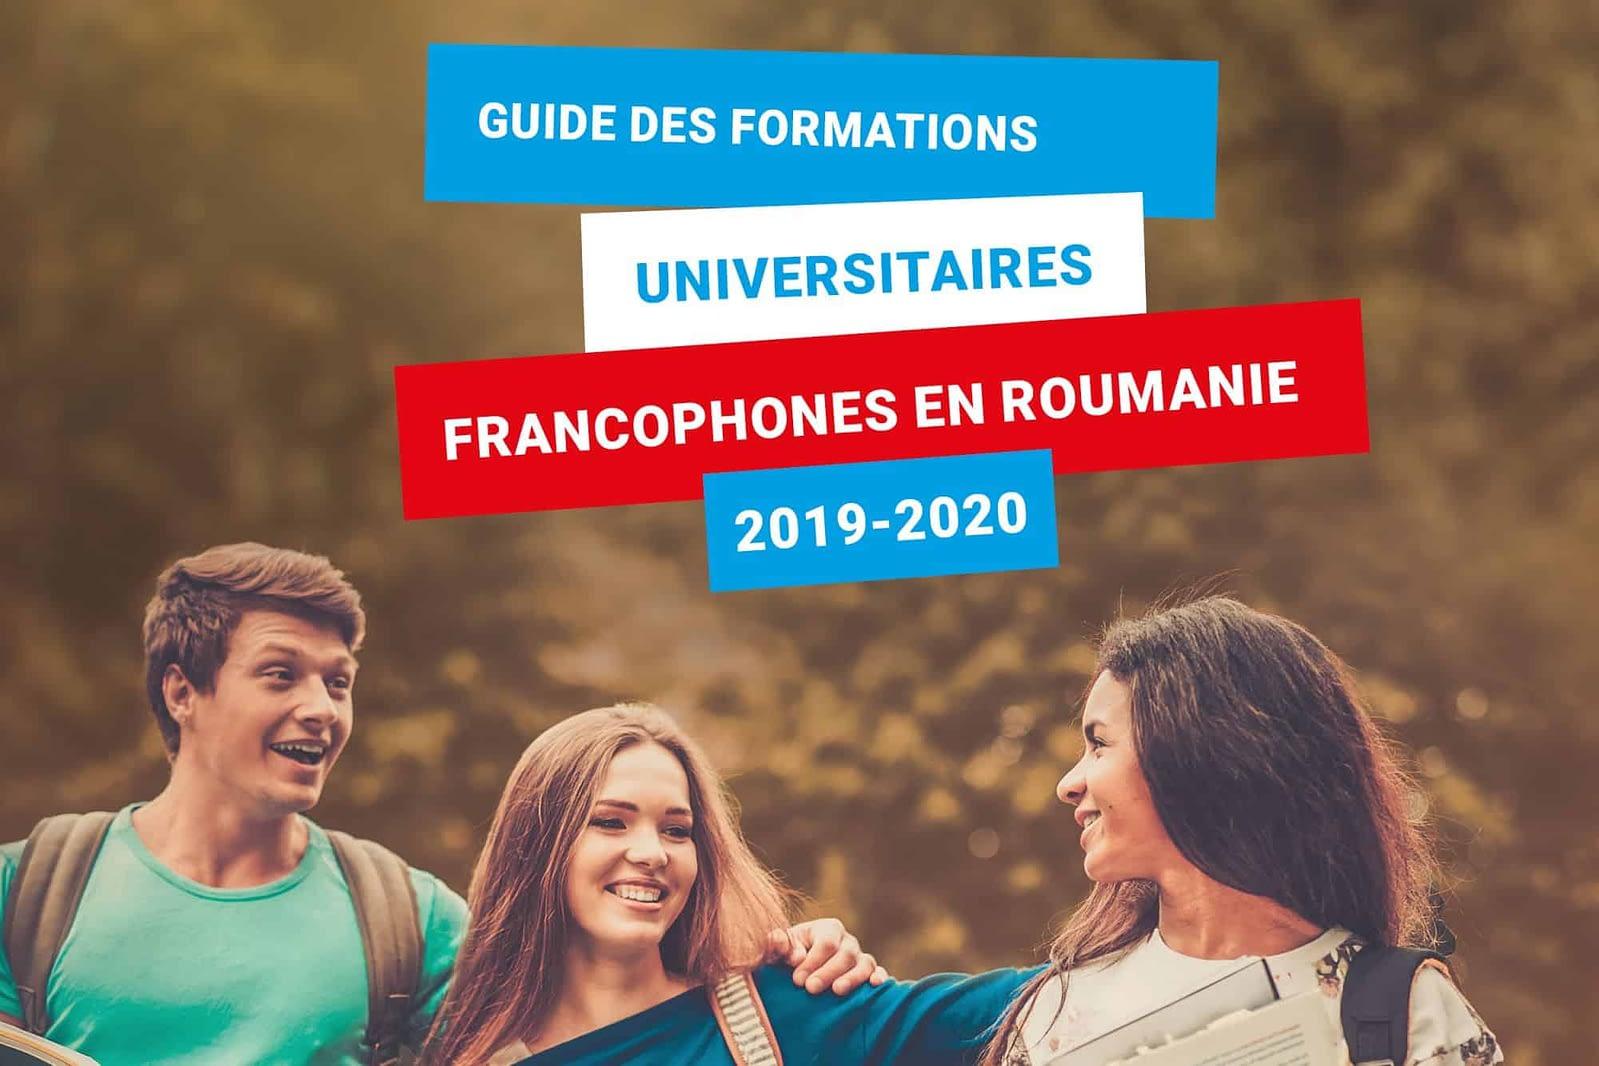 ghid filiere universitare, design, publishing design, booklet, Institutul Francez din Romania, Toud